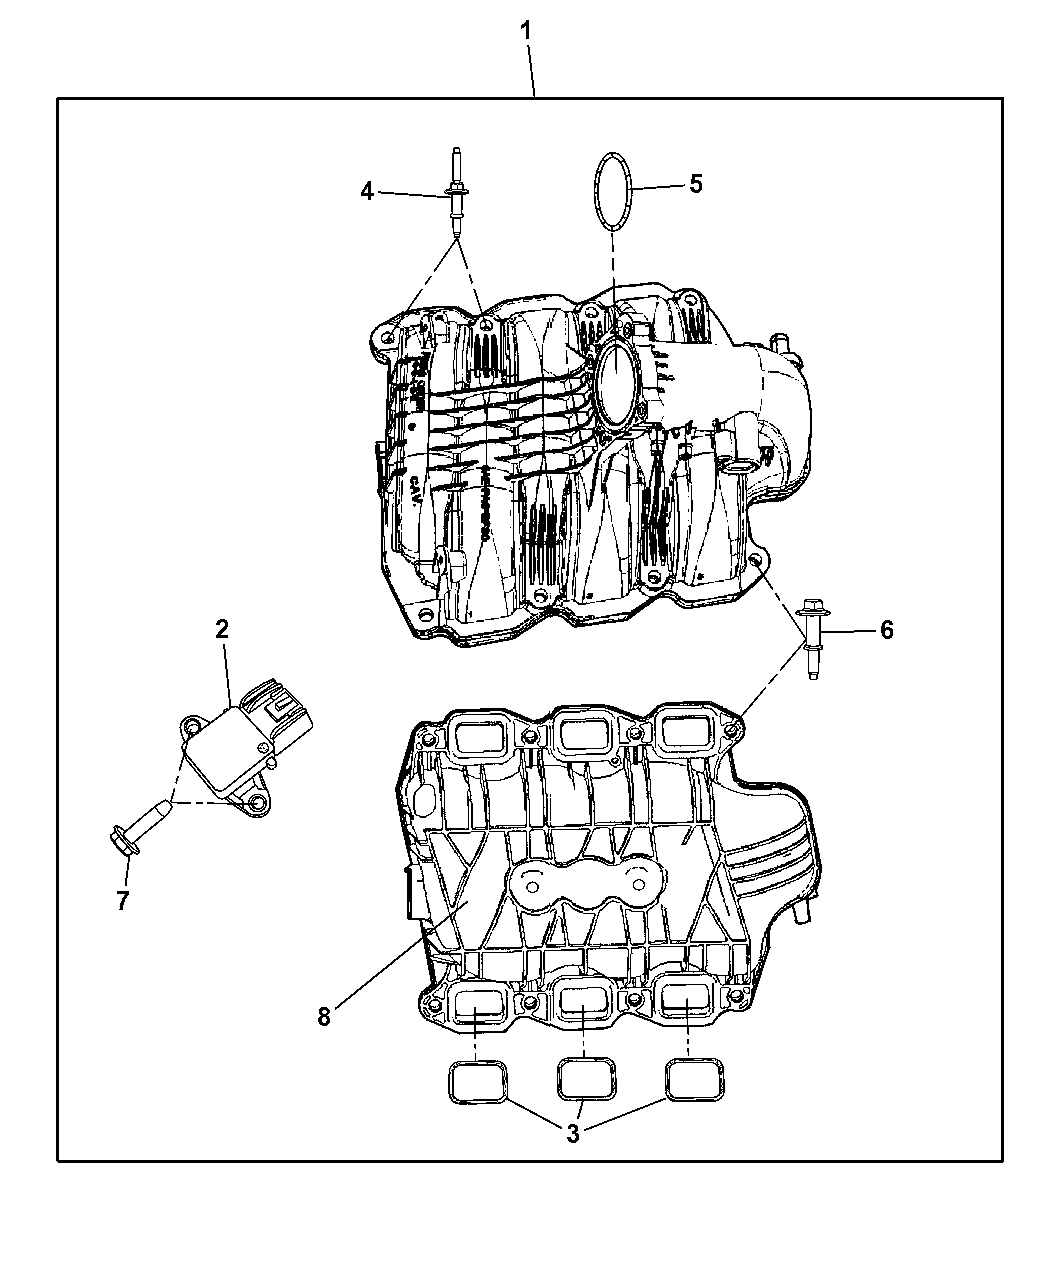 2008 Jeep Commander Engine Diagram